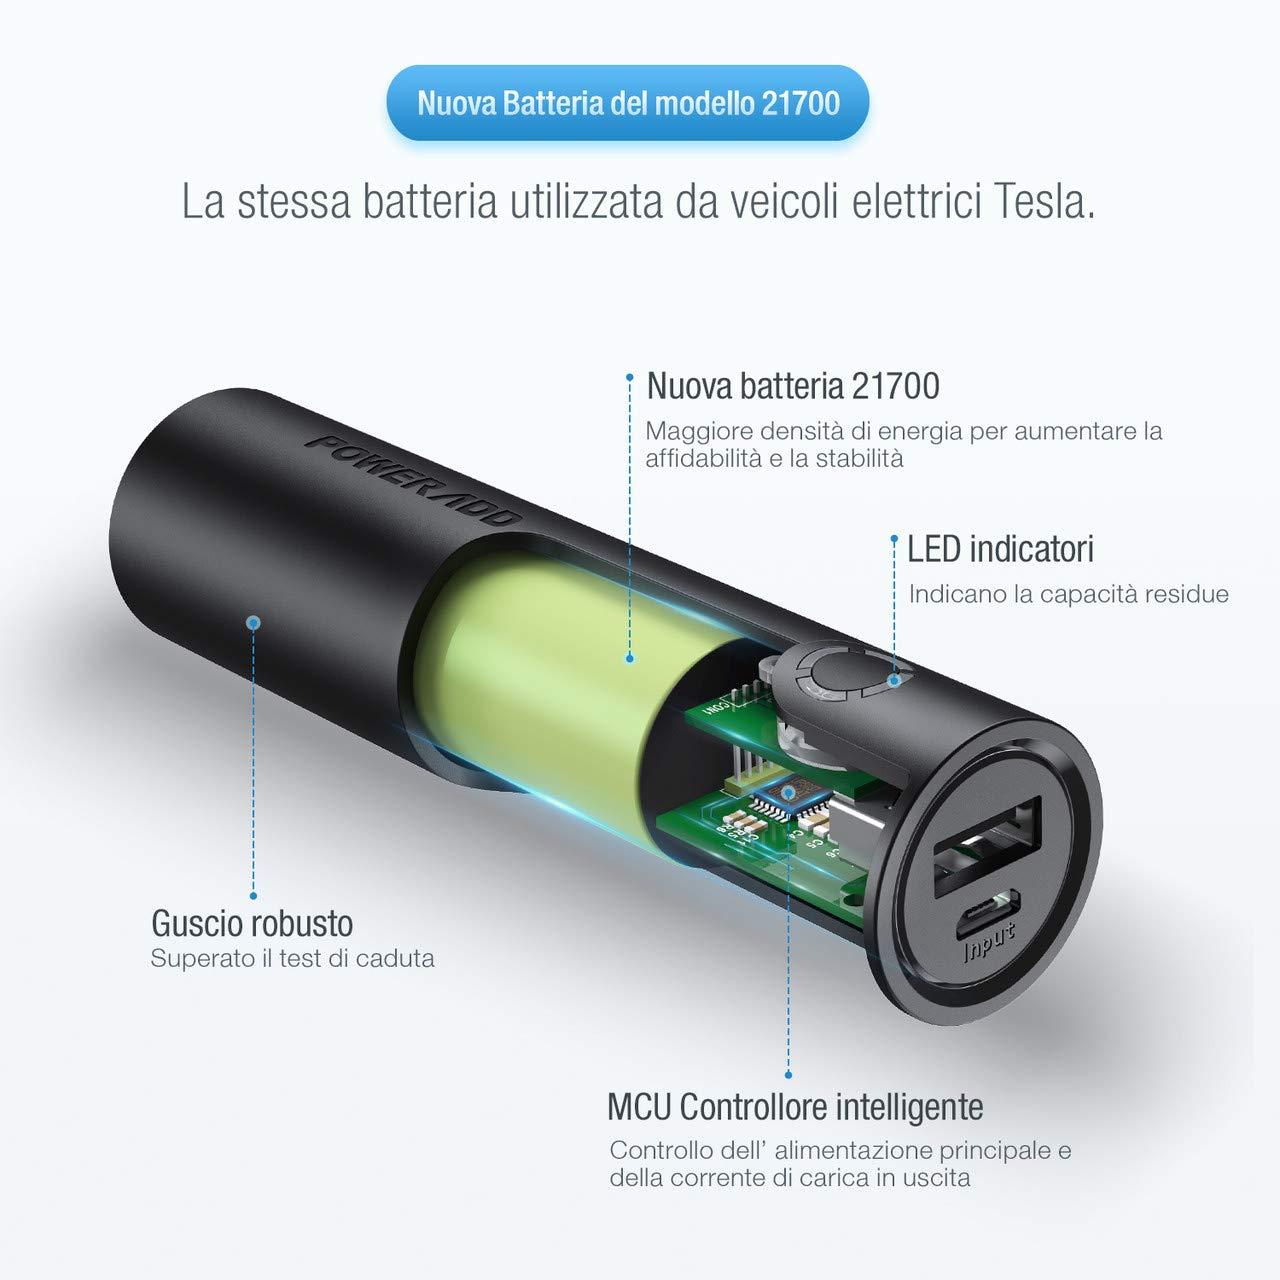 POWERADD EnergyCell PowerBank 5000mAh Caricabatterie Portatile con Output da 2.4A Ricarica Rapida Portatile Caricabatterie per Huawei, Samsung, iPhone, Xiaomi - (Un Cavo Micro USB)